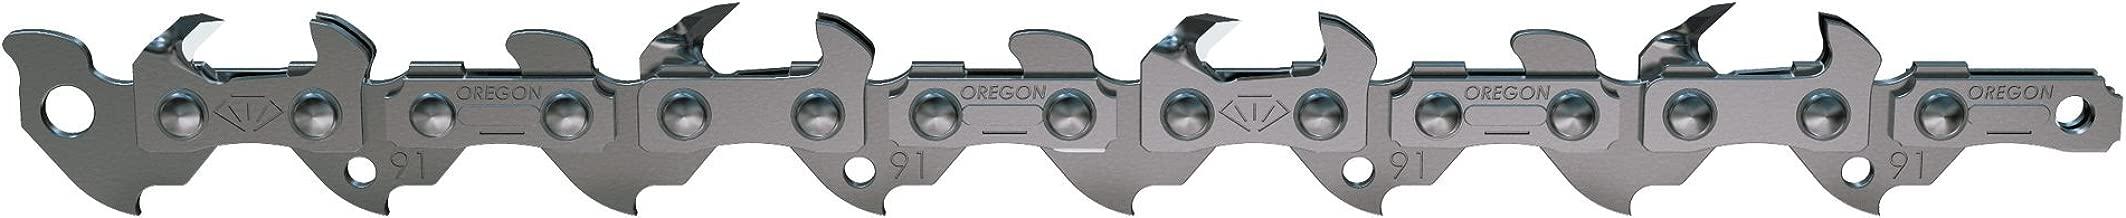 Oregon PS56 PowerSharp 16-Inch Chainsaw Chain For Craftsman, Echo, Homelite, Poulan, Remington